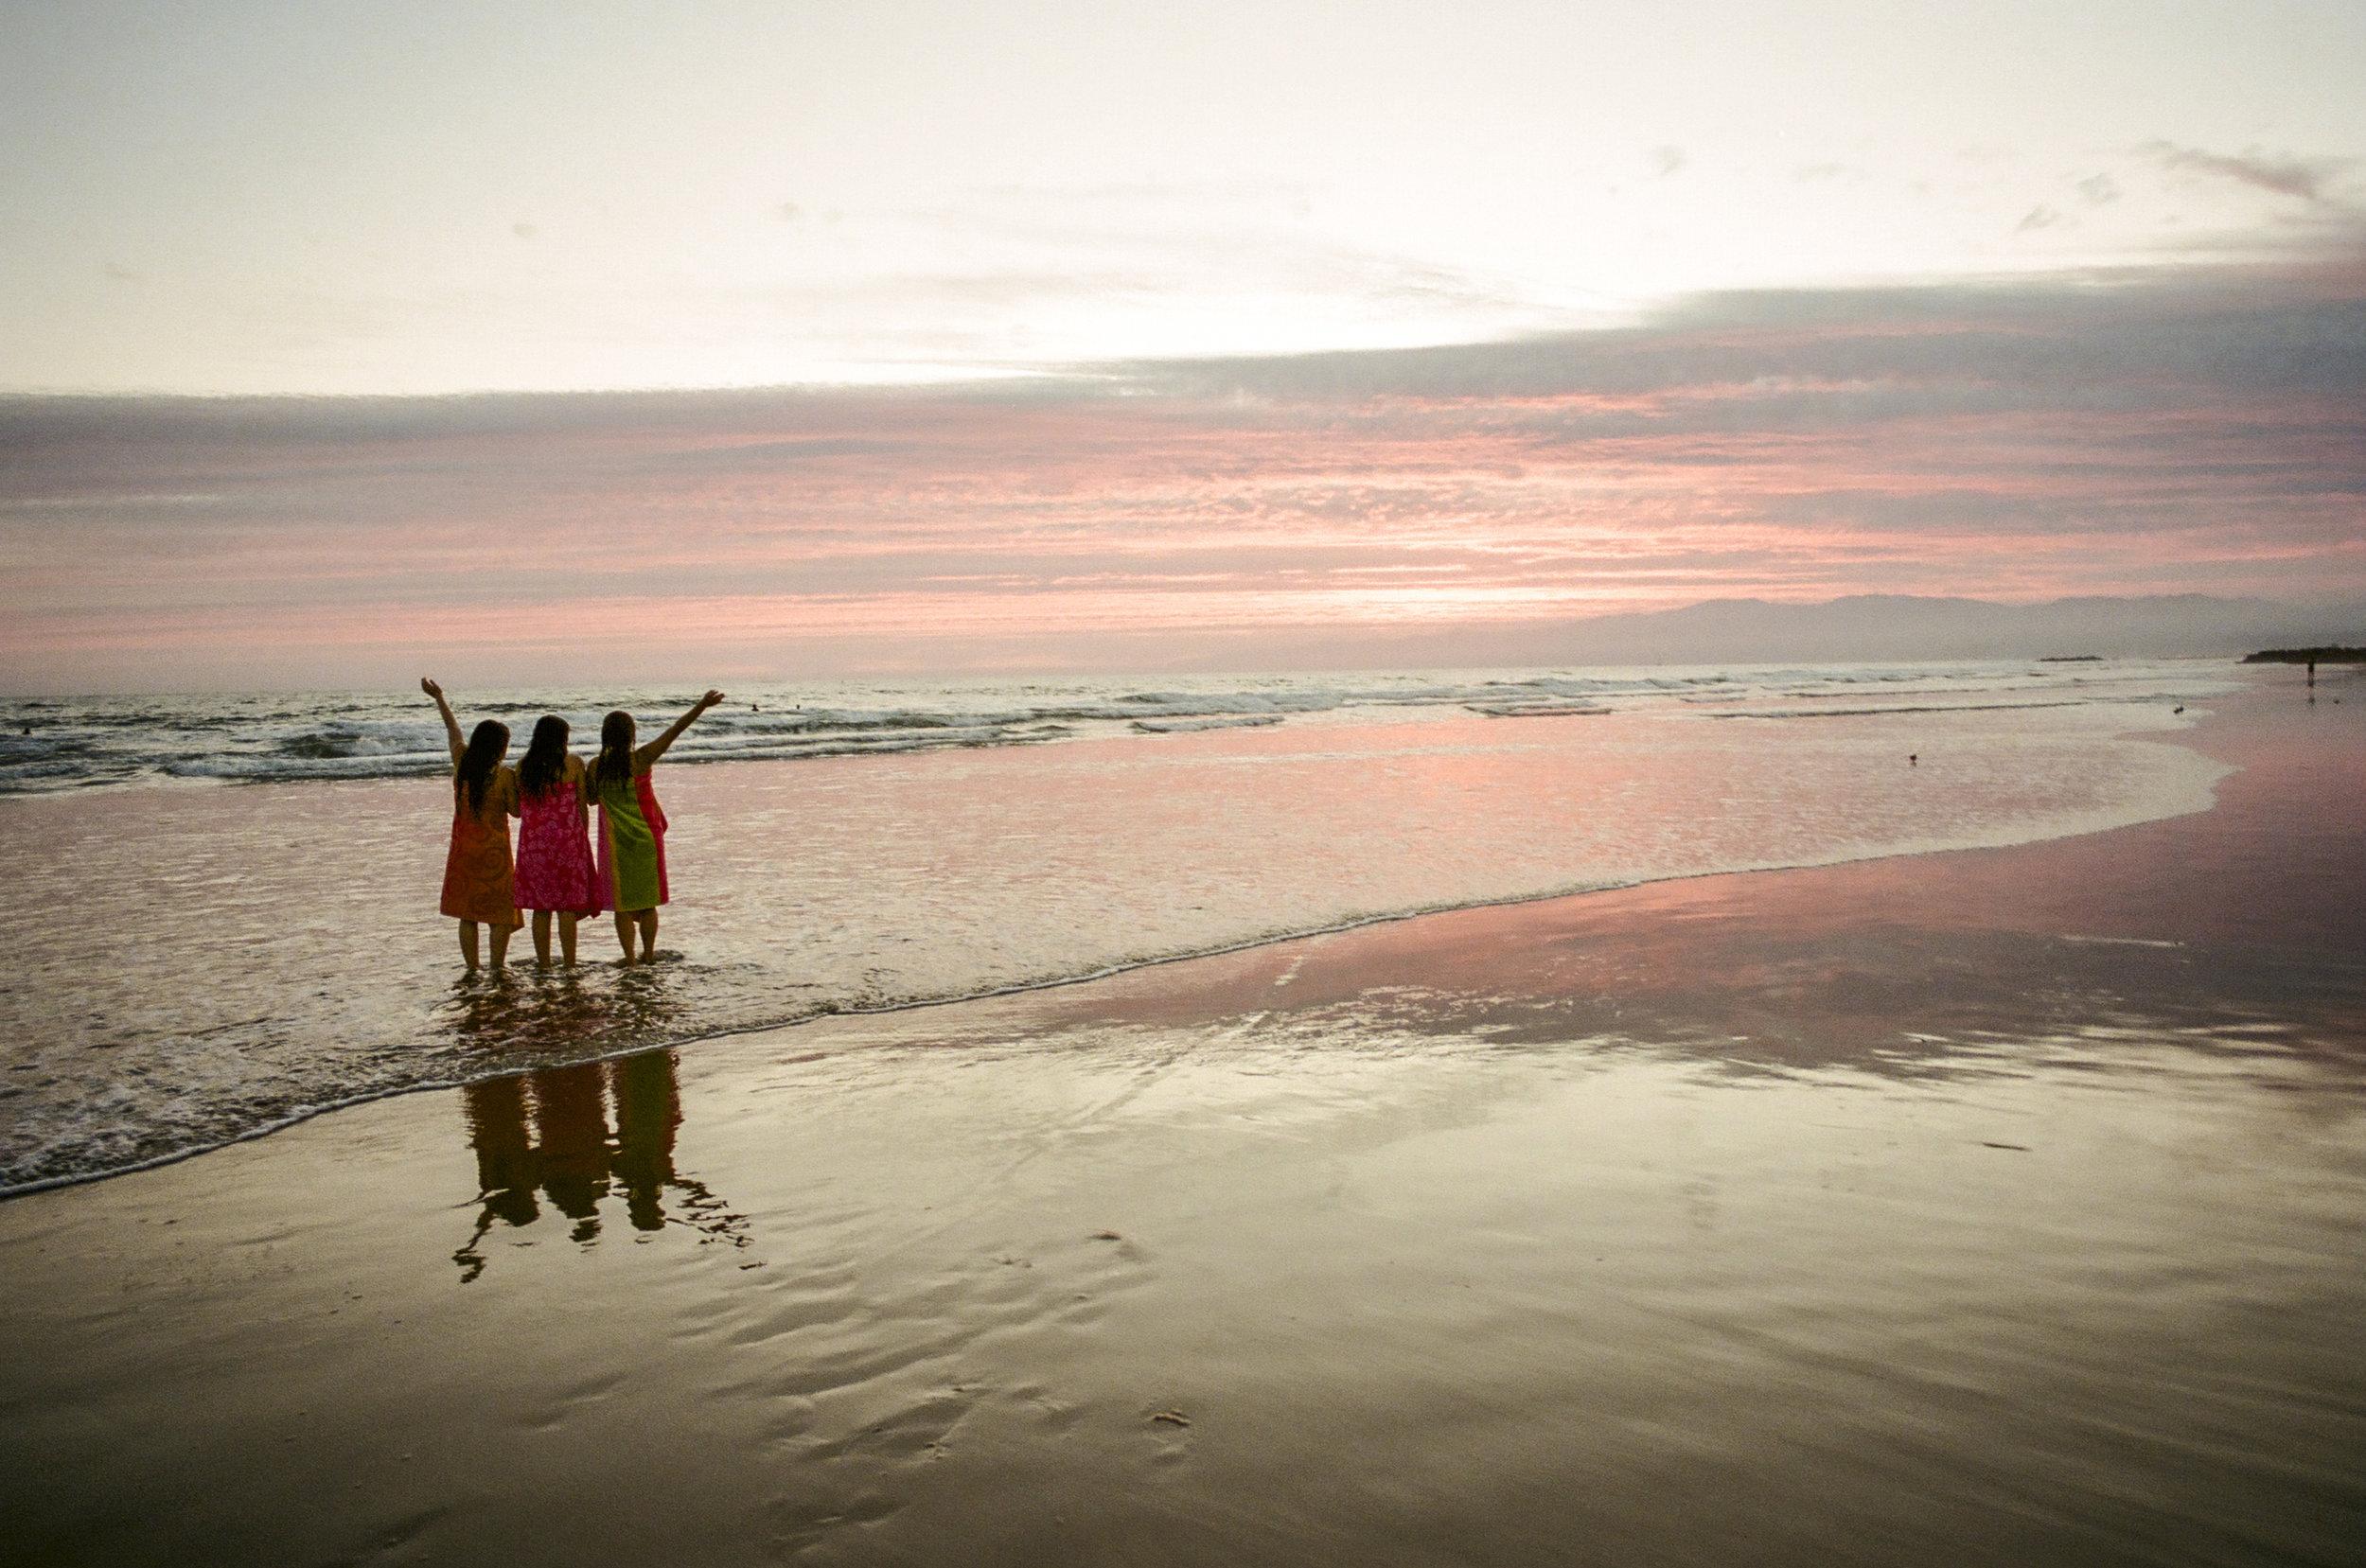 Sunset celebration | Leica M5 - 35 Summicron - Kodak Portra 400 | Tony Klimas